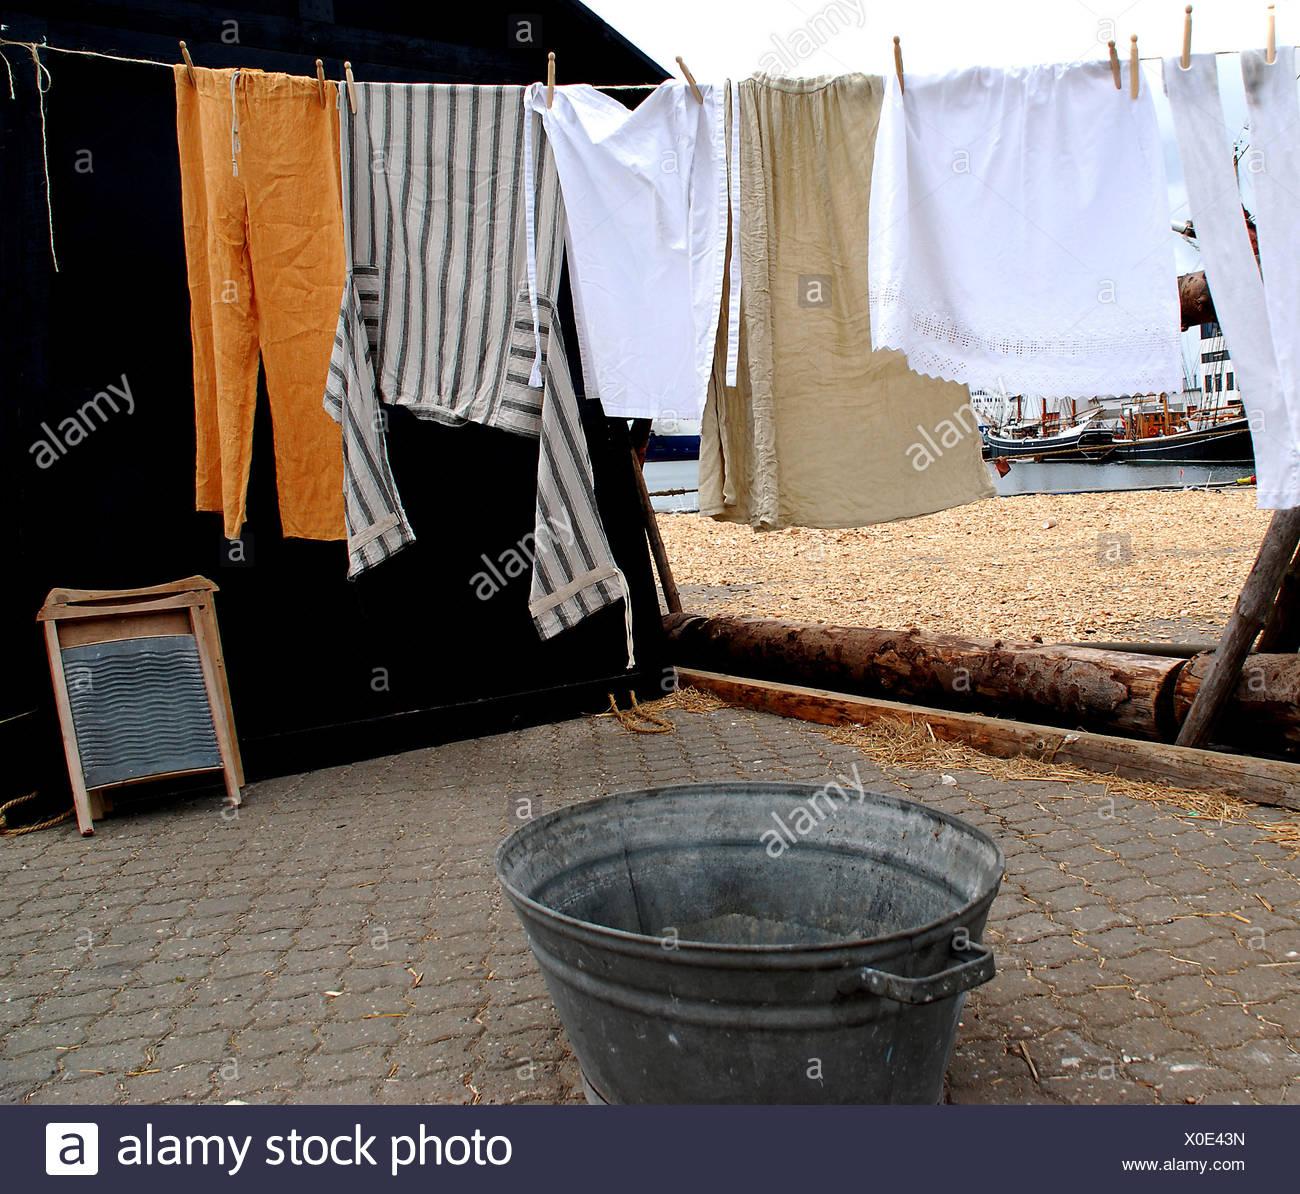 Wash Washing Dry Clothesline Laundry Bath Tub Tub Bathtub Washboard Hanged    Stock Image